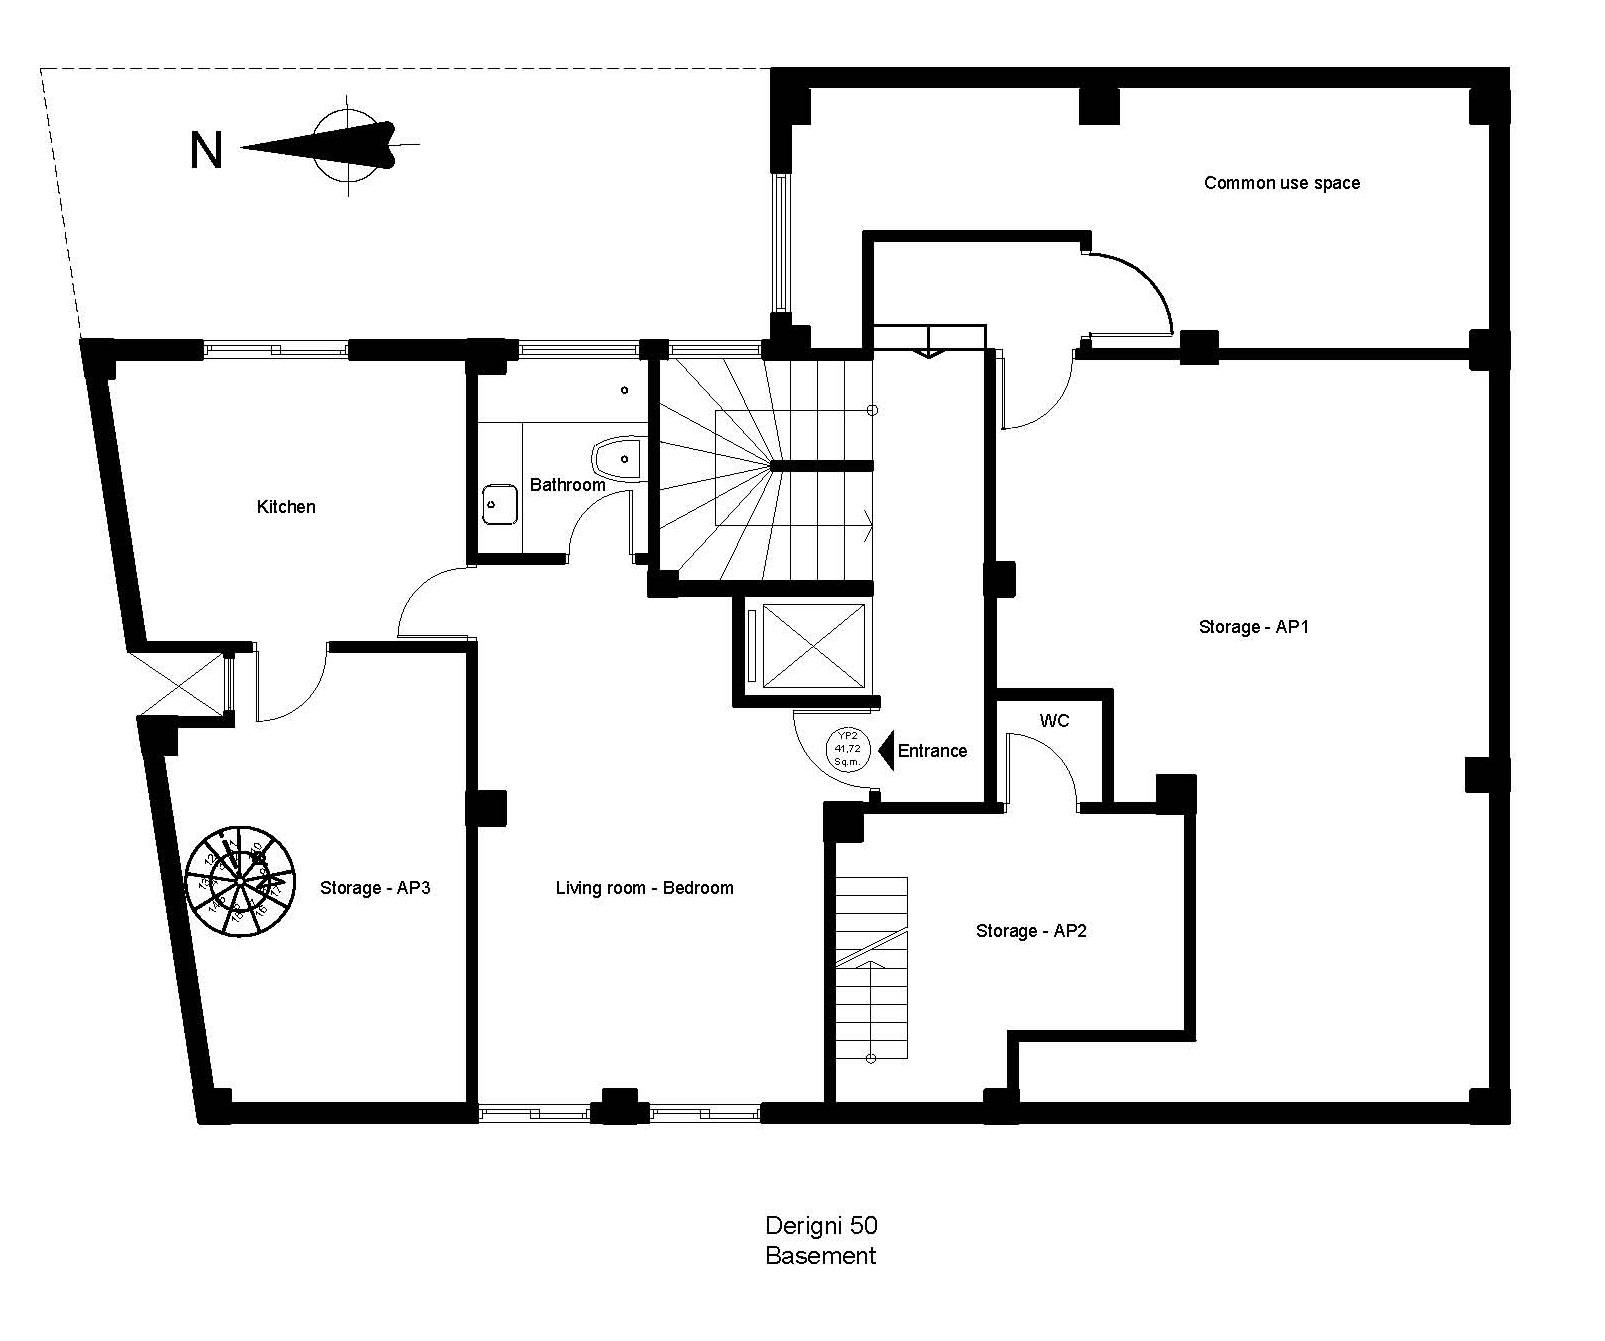 Derigni 50 basement plan